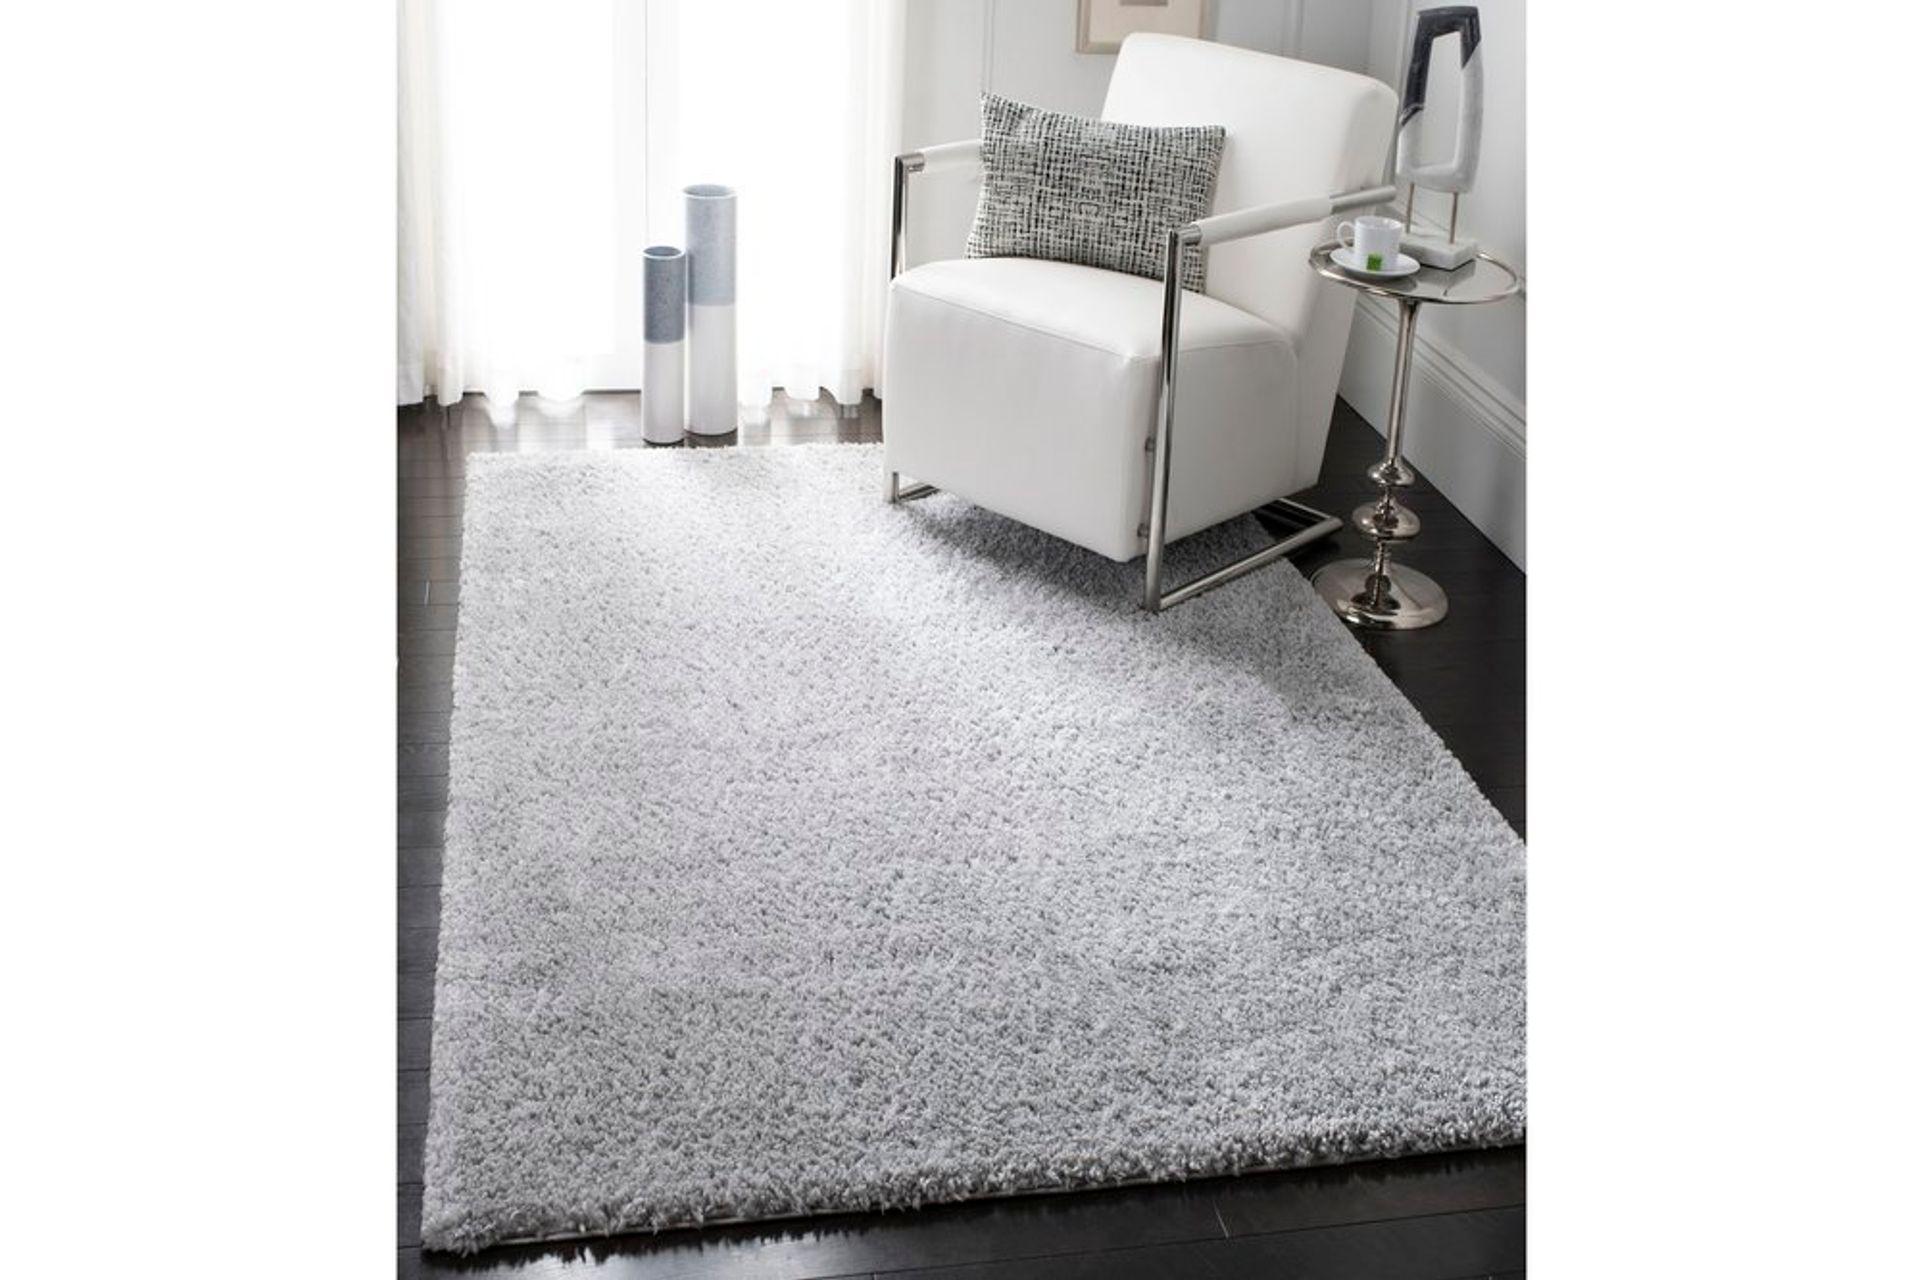 Ava Minimalist Woven Rug, 160 x 230, Grey